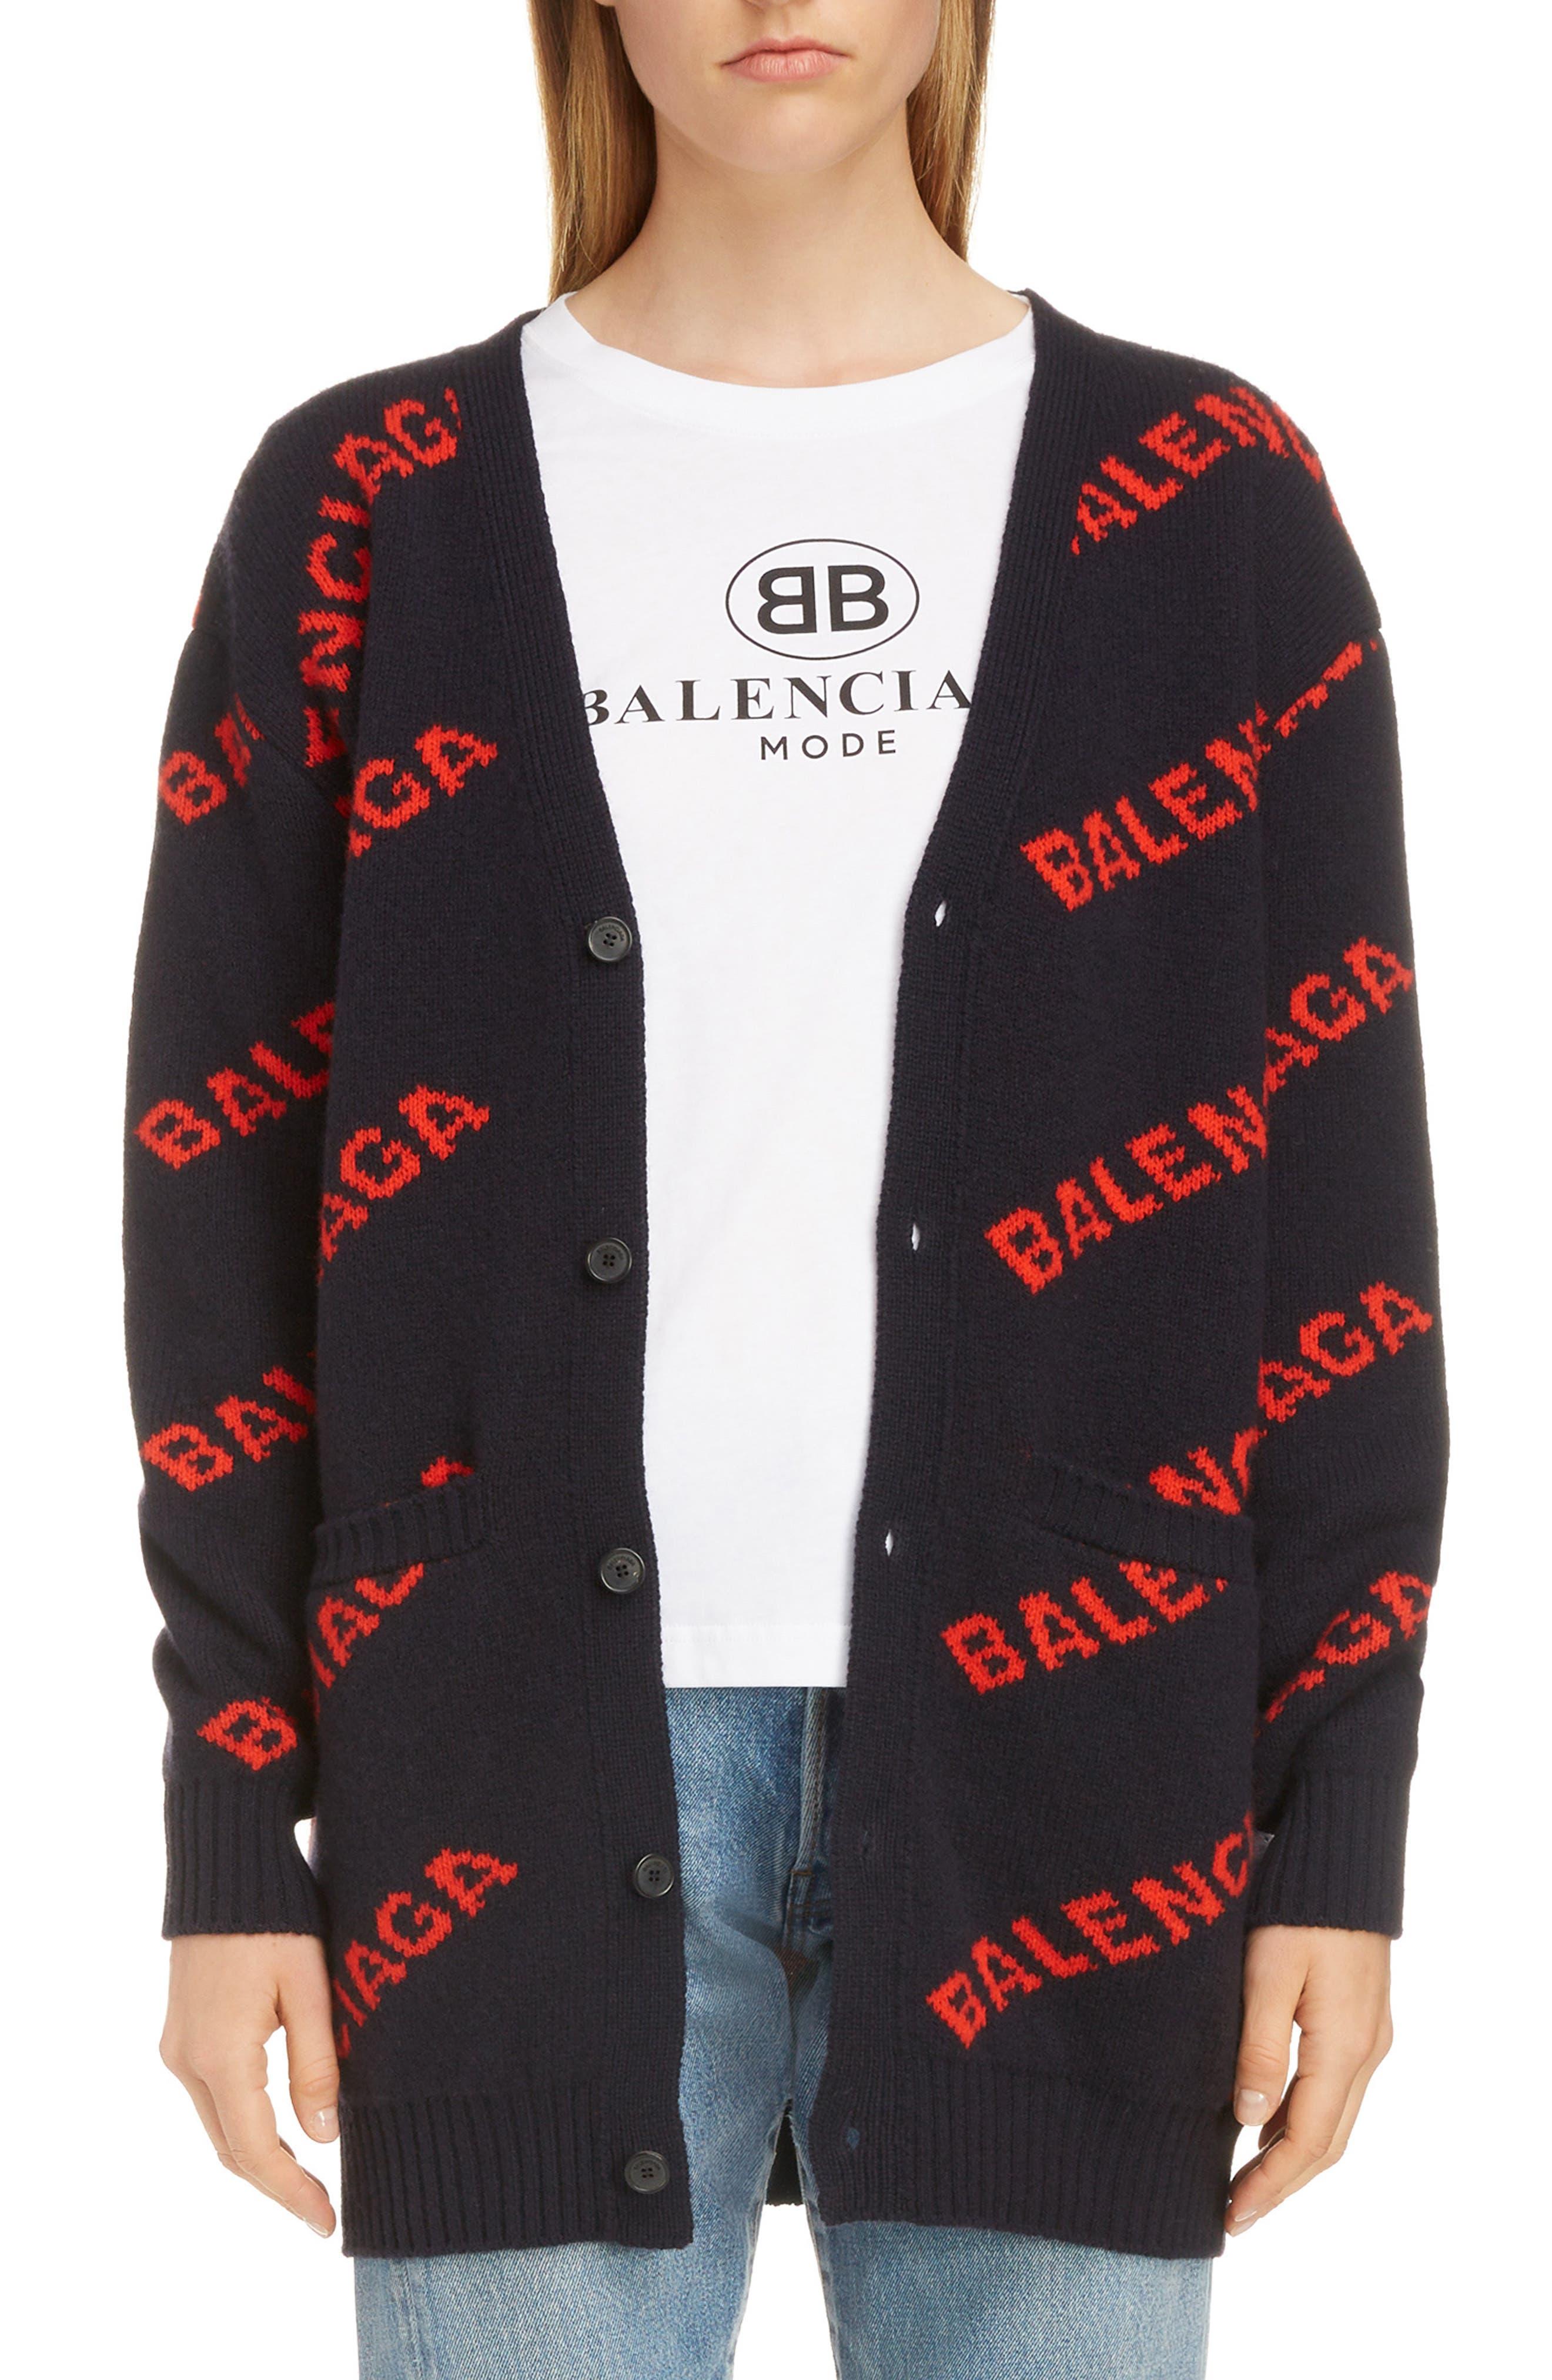 2ba7c274ff859 Buy balenciaga sweaters for women - Best women s balenciaga sweaters ...